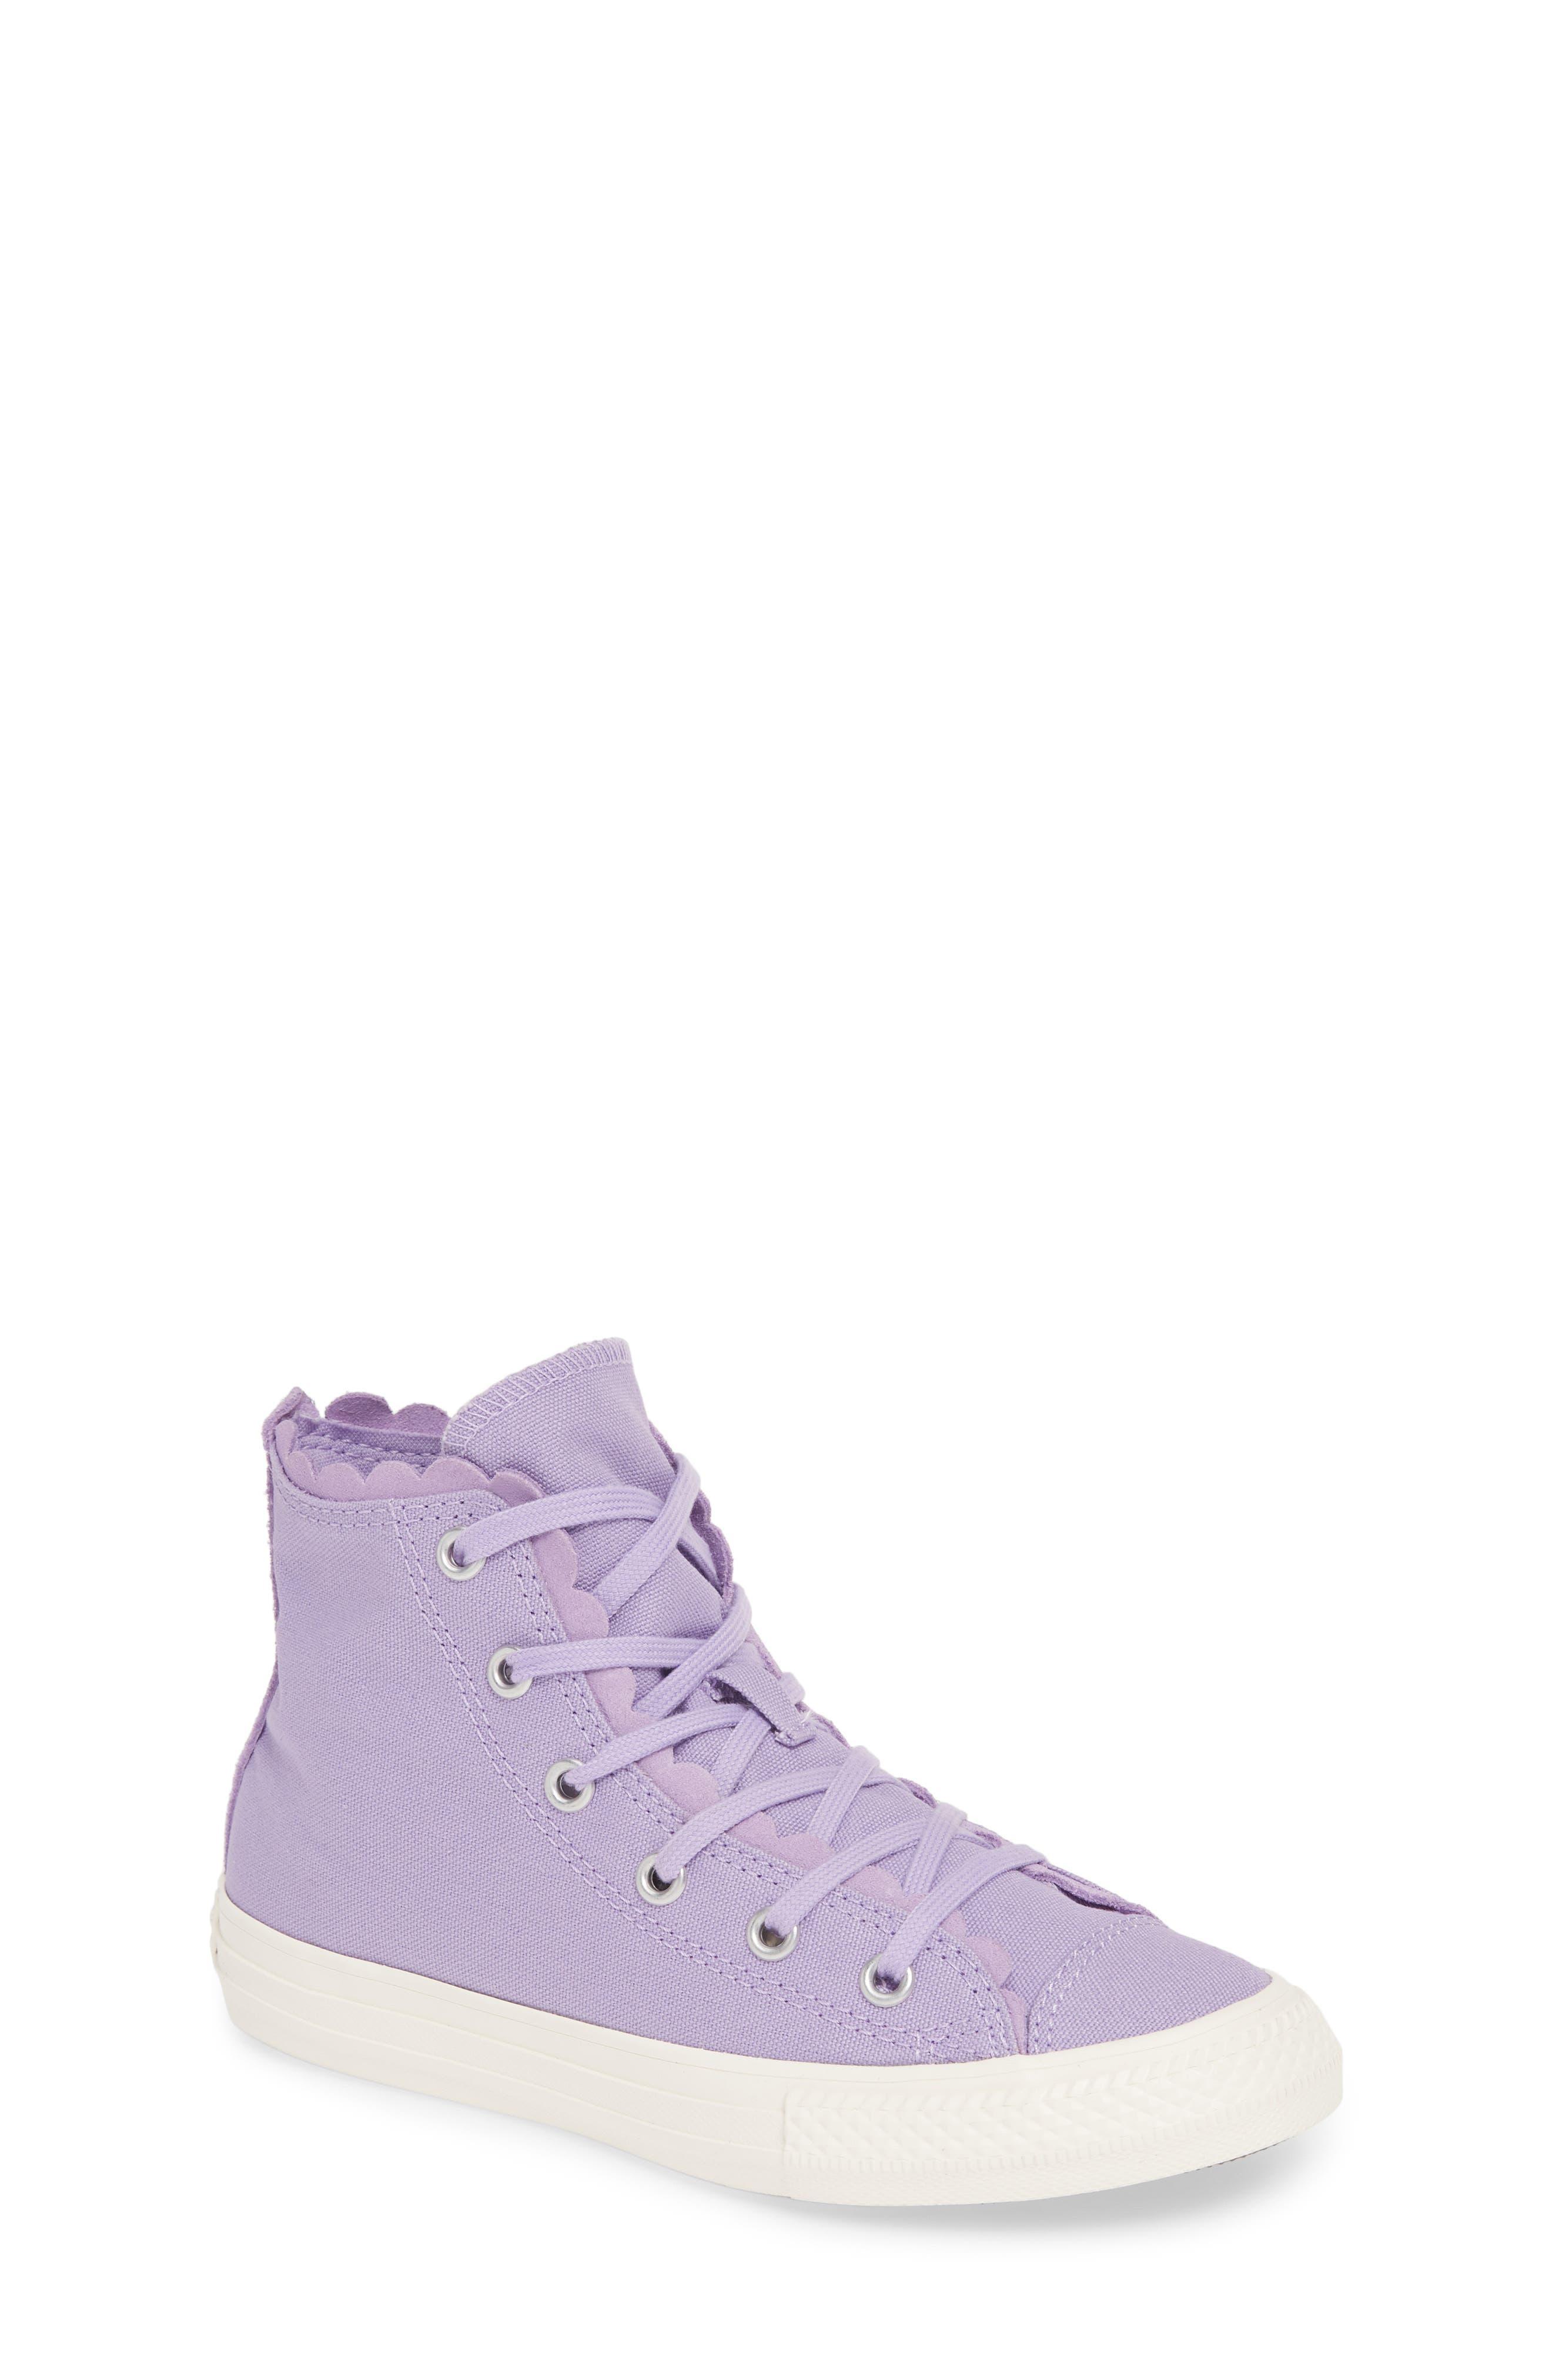 Converse Chuck Taylor All Star Frill High Top Sneaker